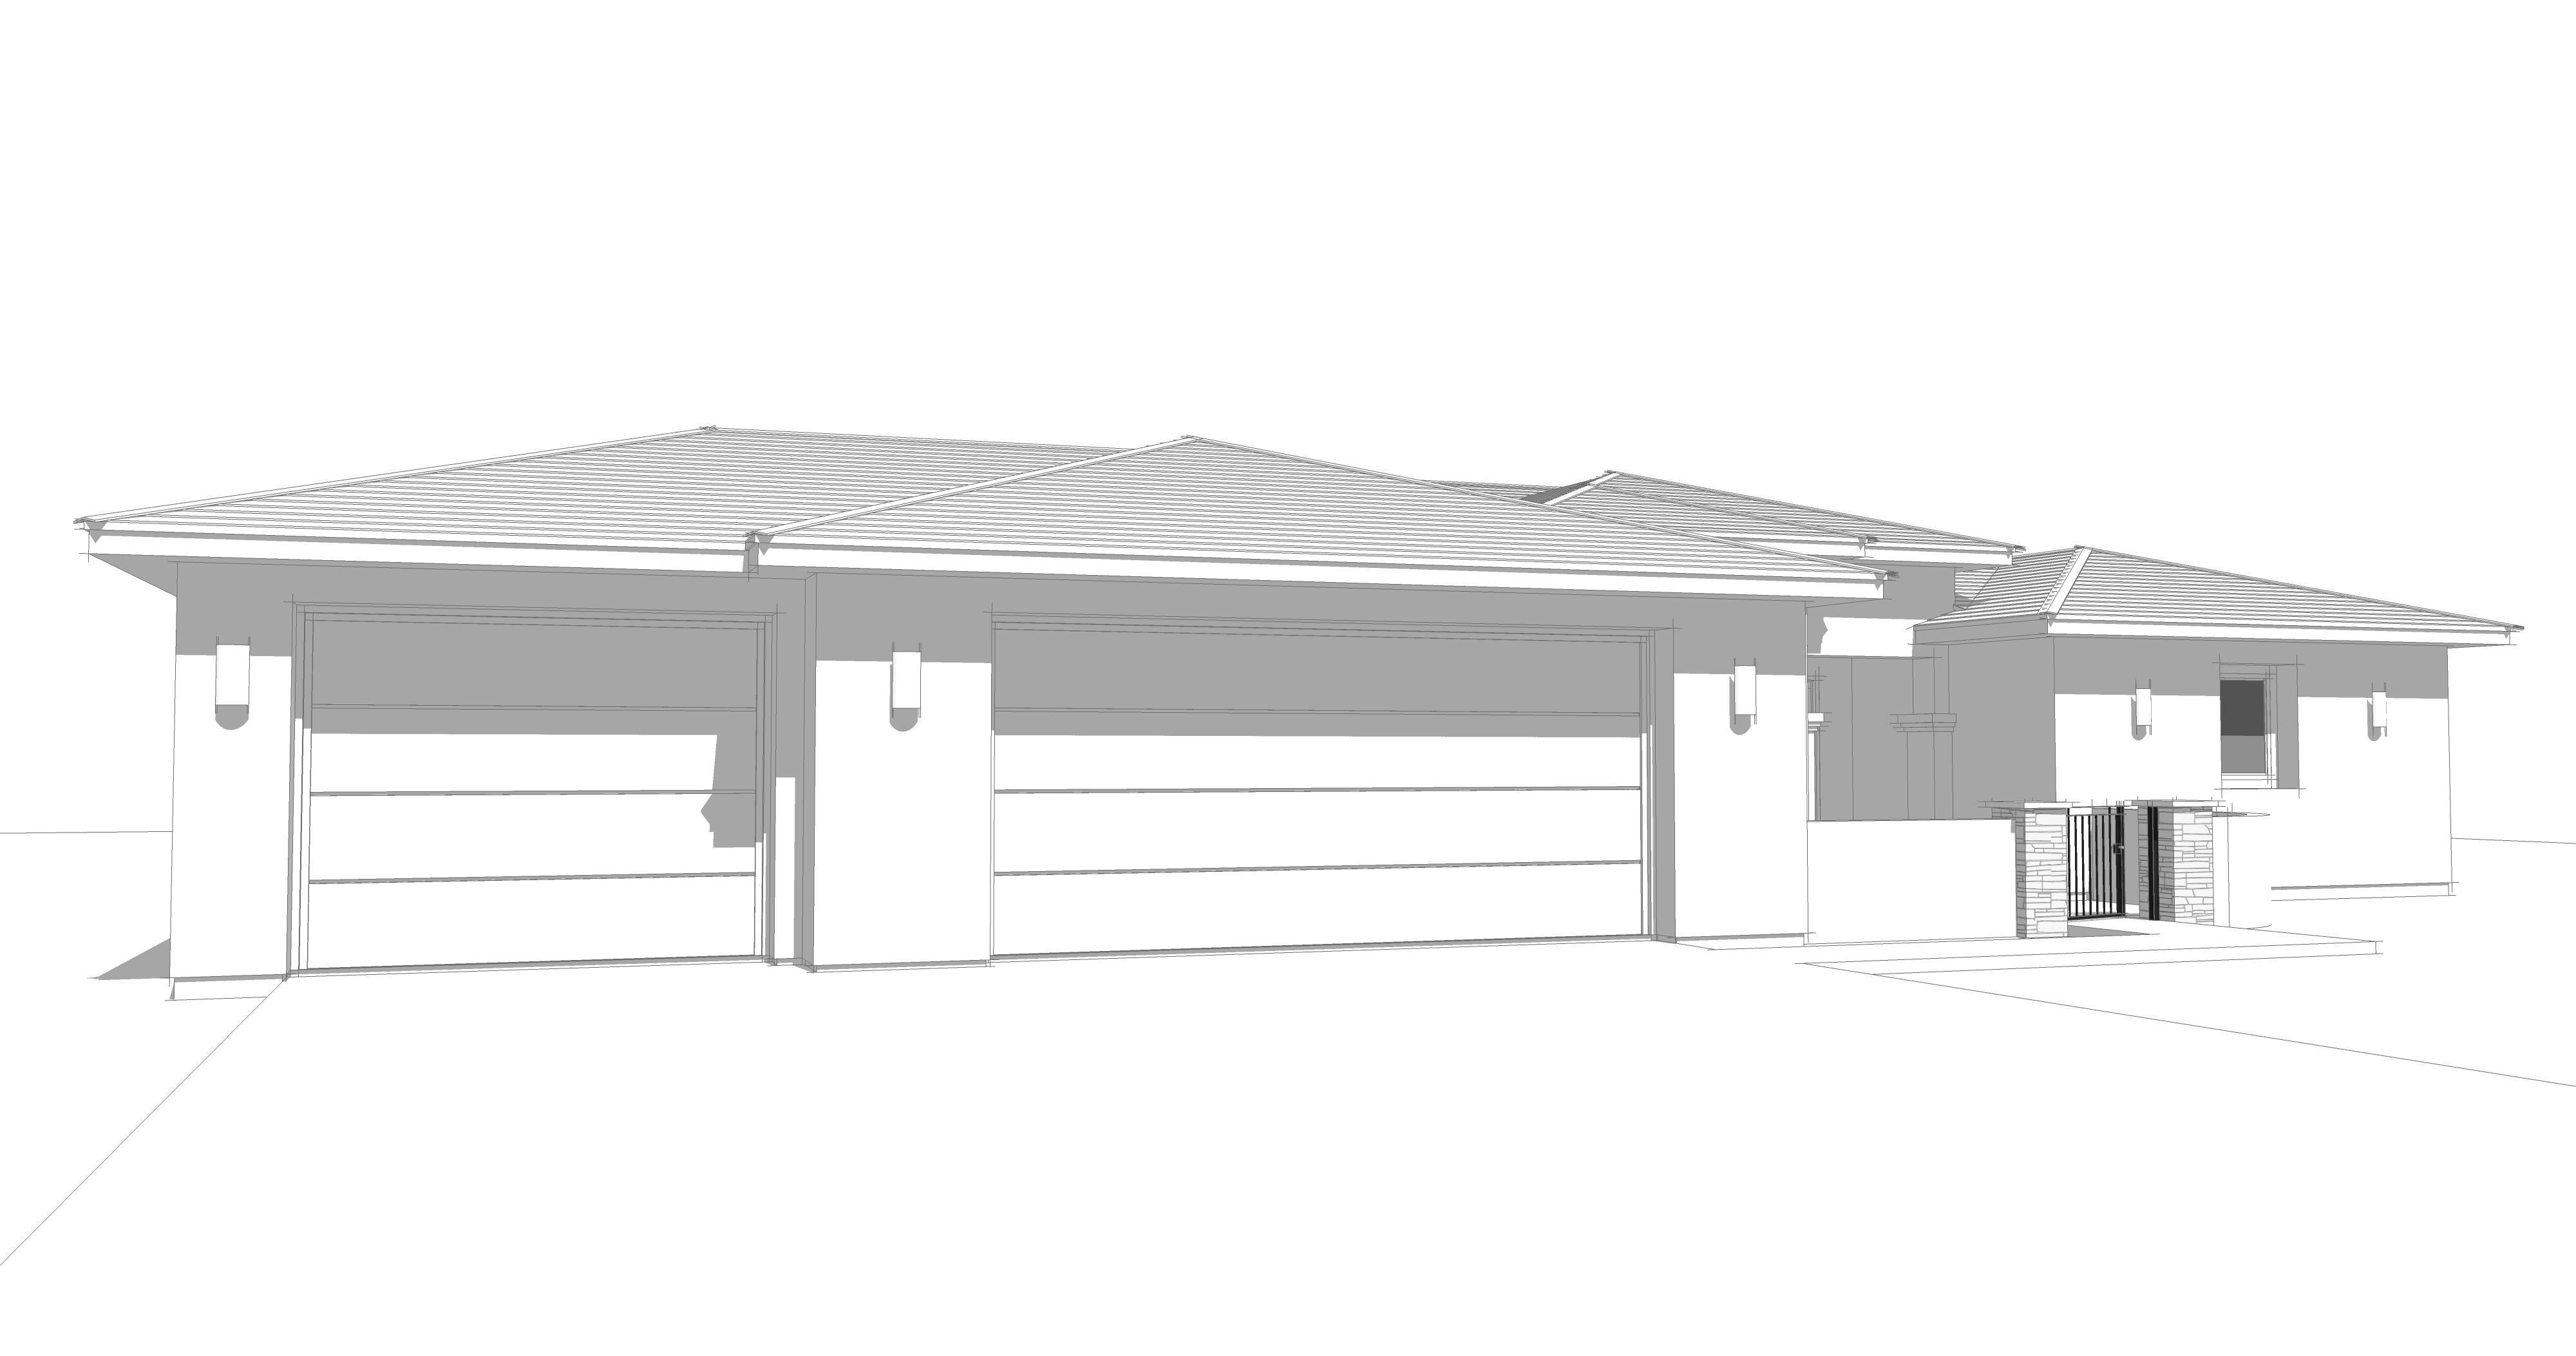 Emerald Garage Model